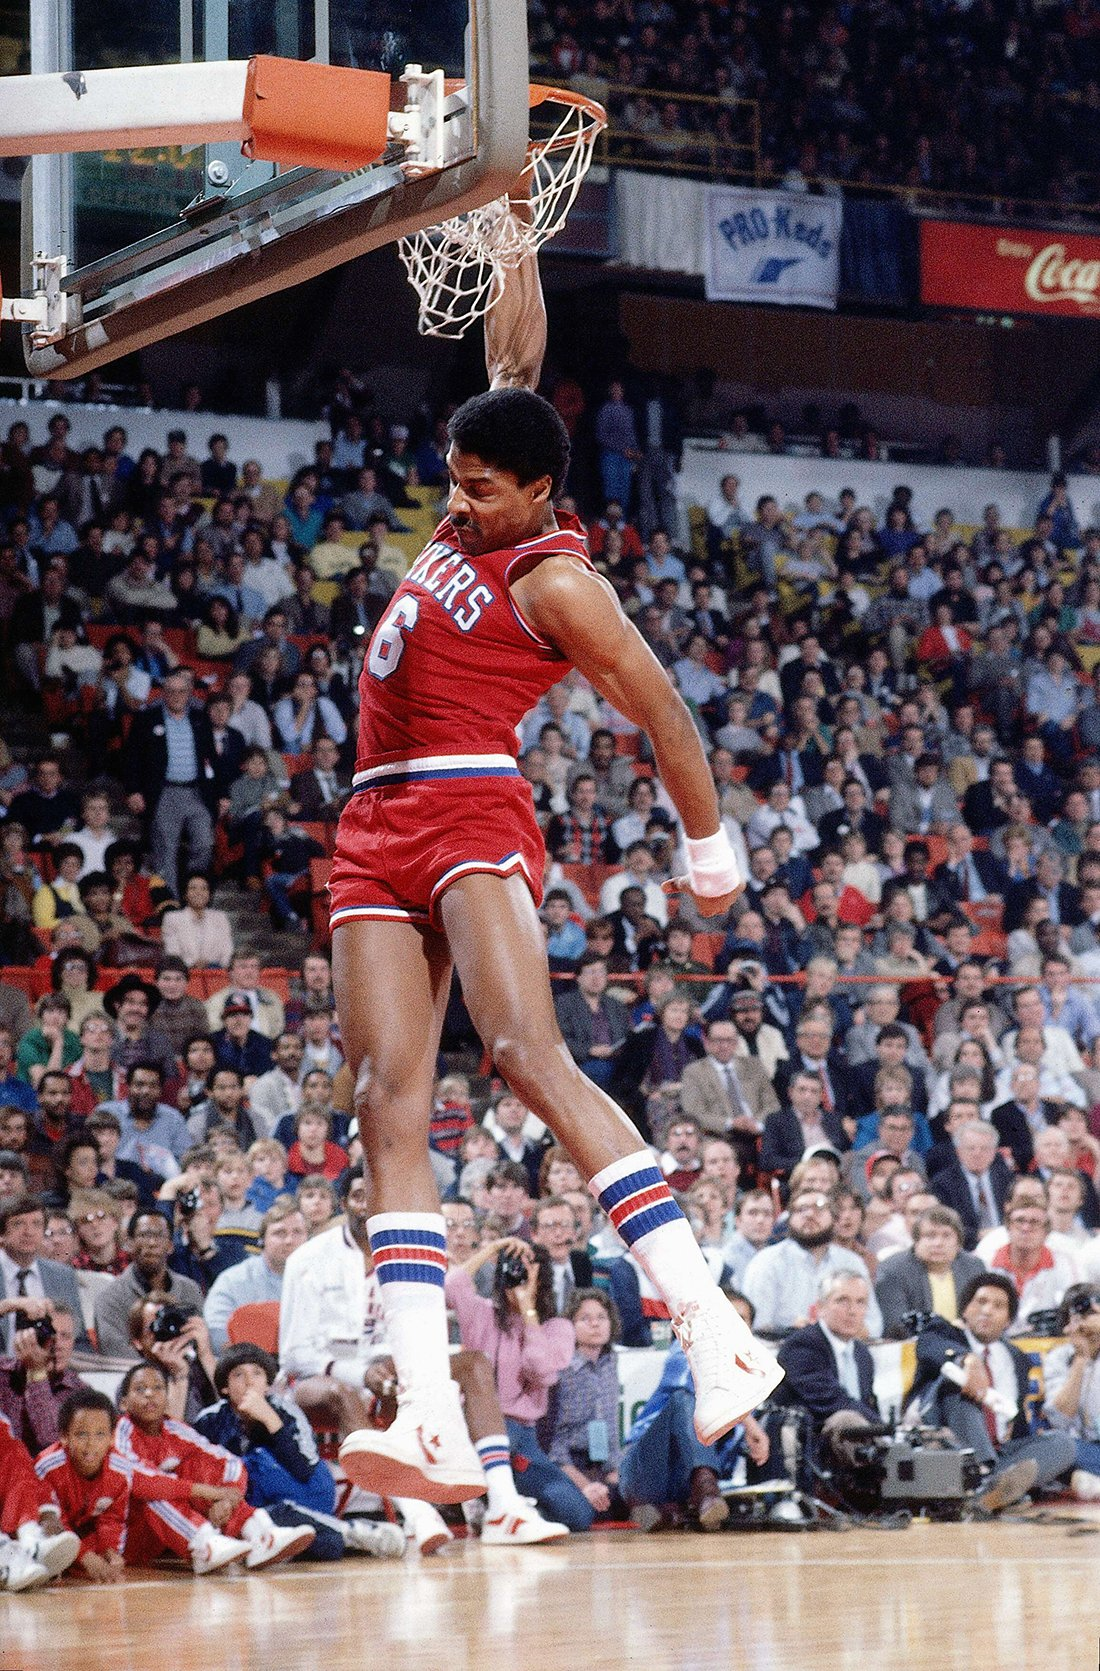 Julius Erving en 1986 All-Star Slam Dunk Contest en viva basquet